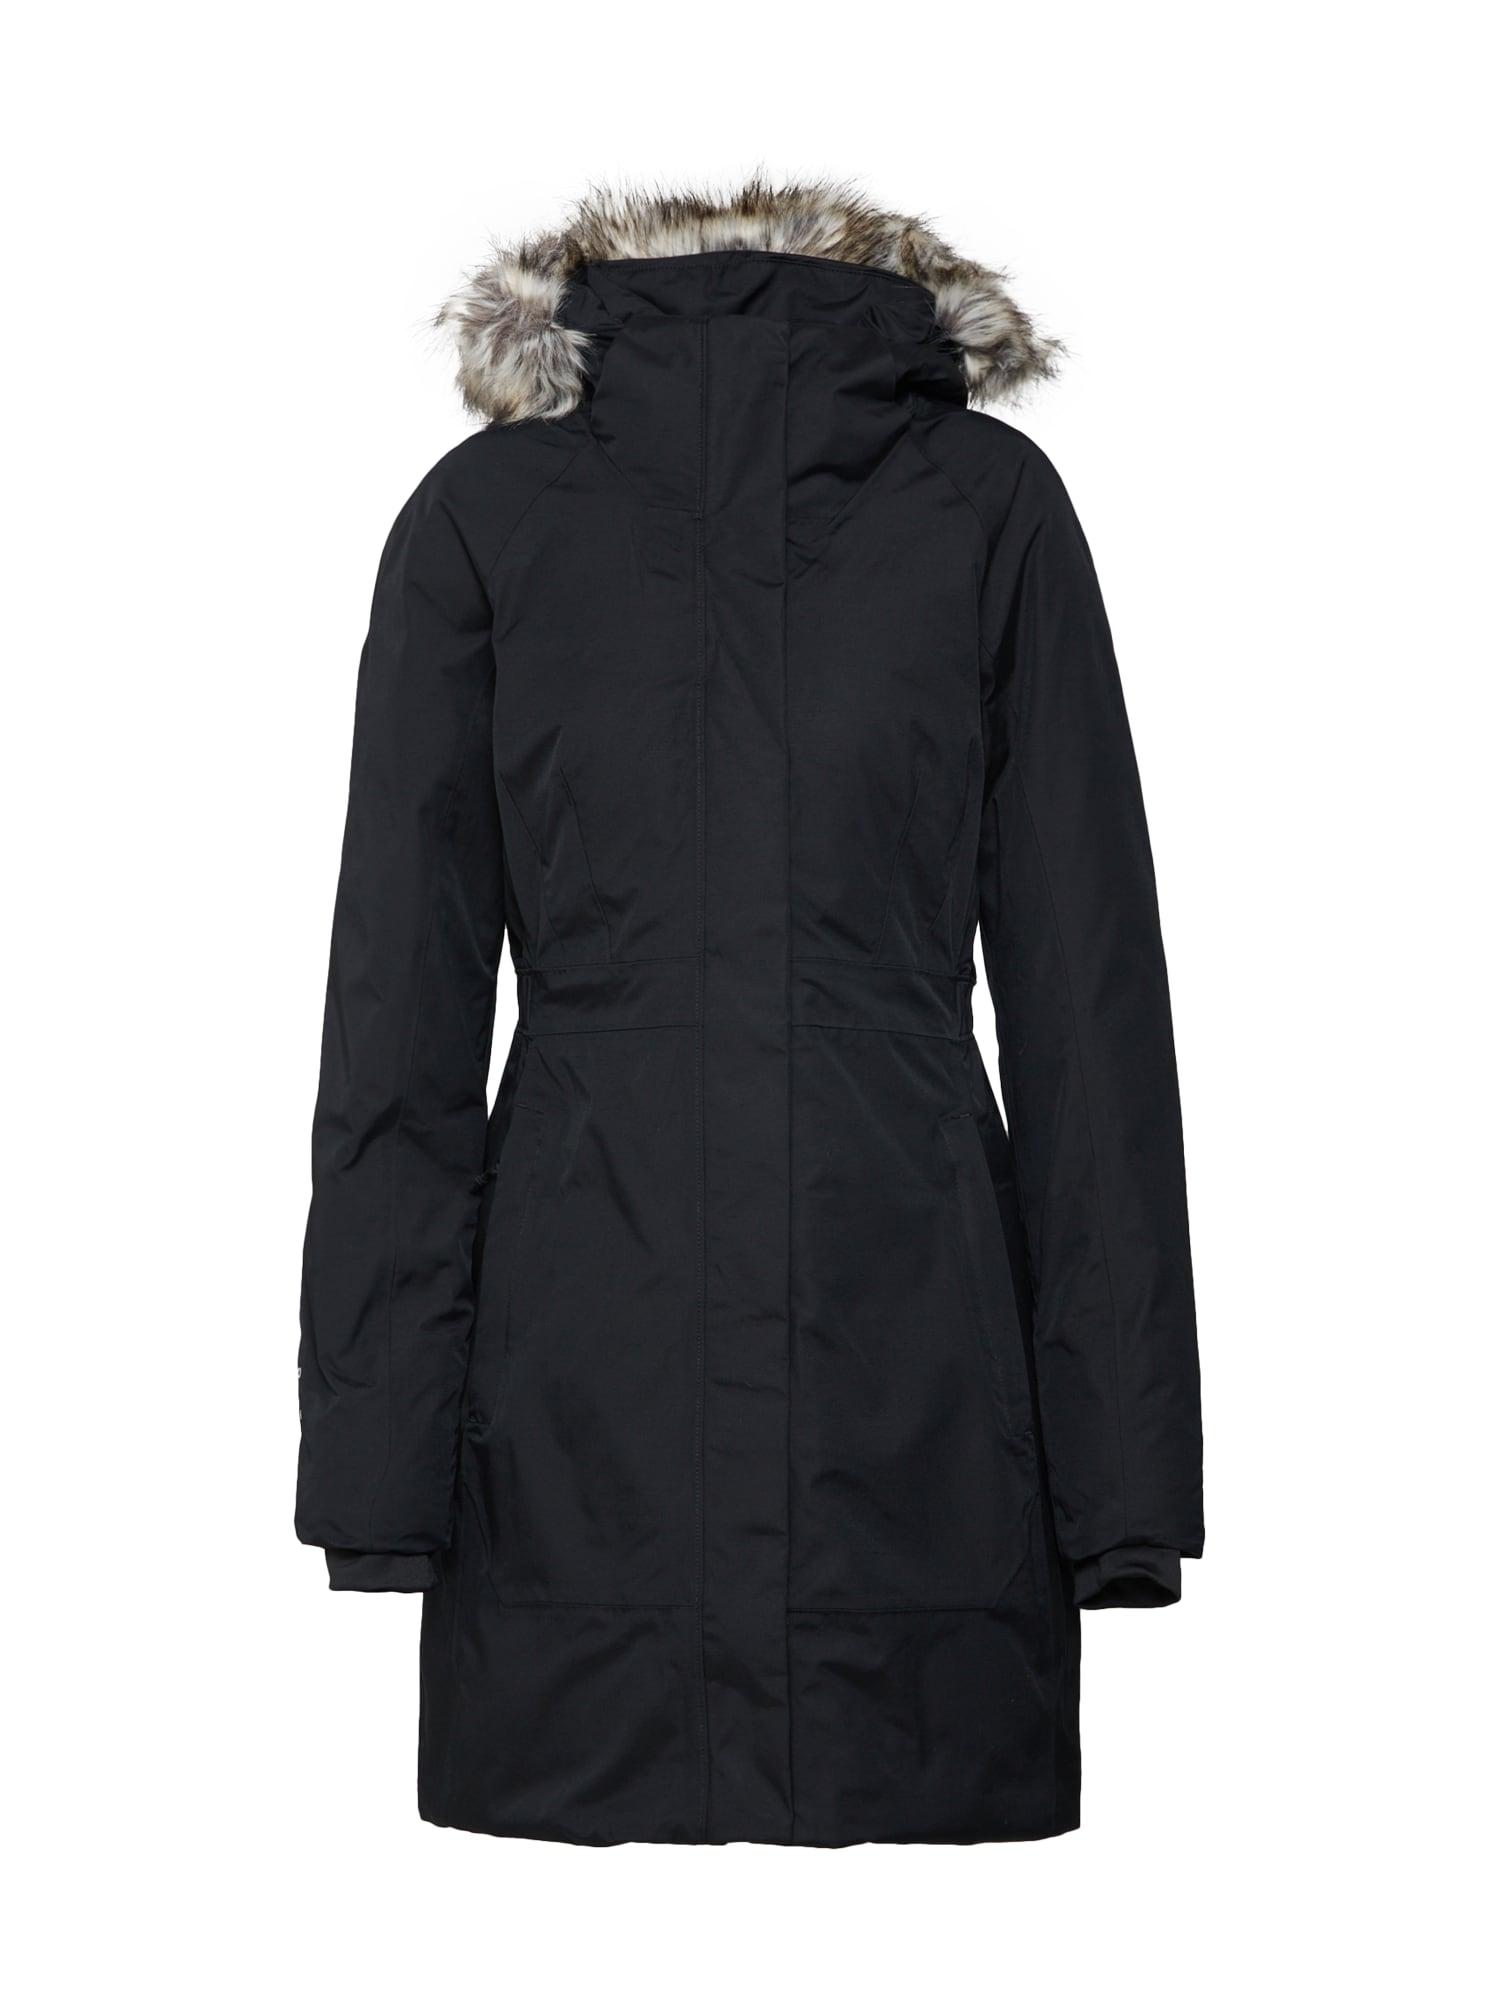 Outdoorový kabát Arctic černá THE NORTH FACE